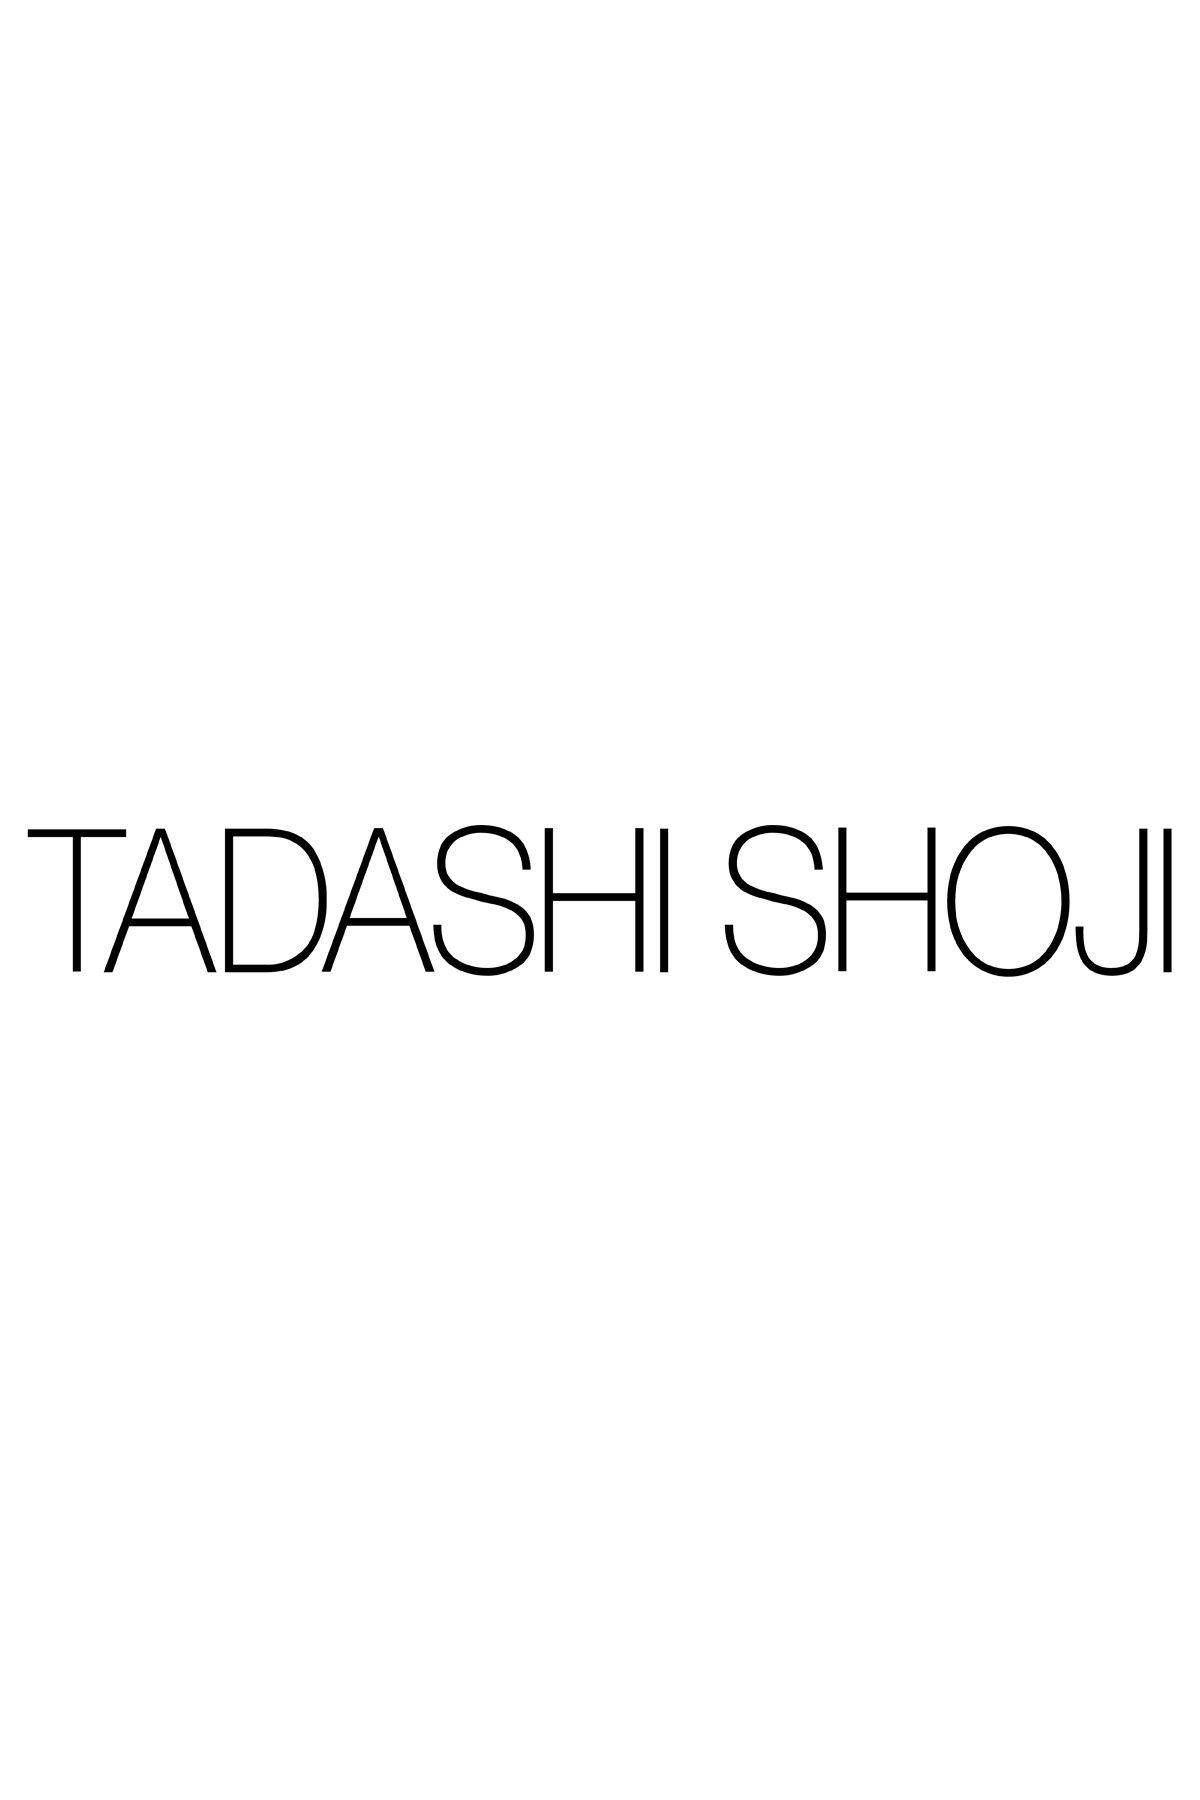 Tadashi Shoji Plus Size - Corded Embroidery on Tulle Cap Sleeve Dress